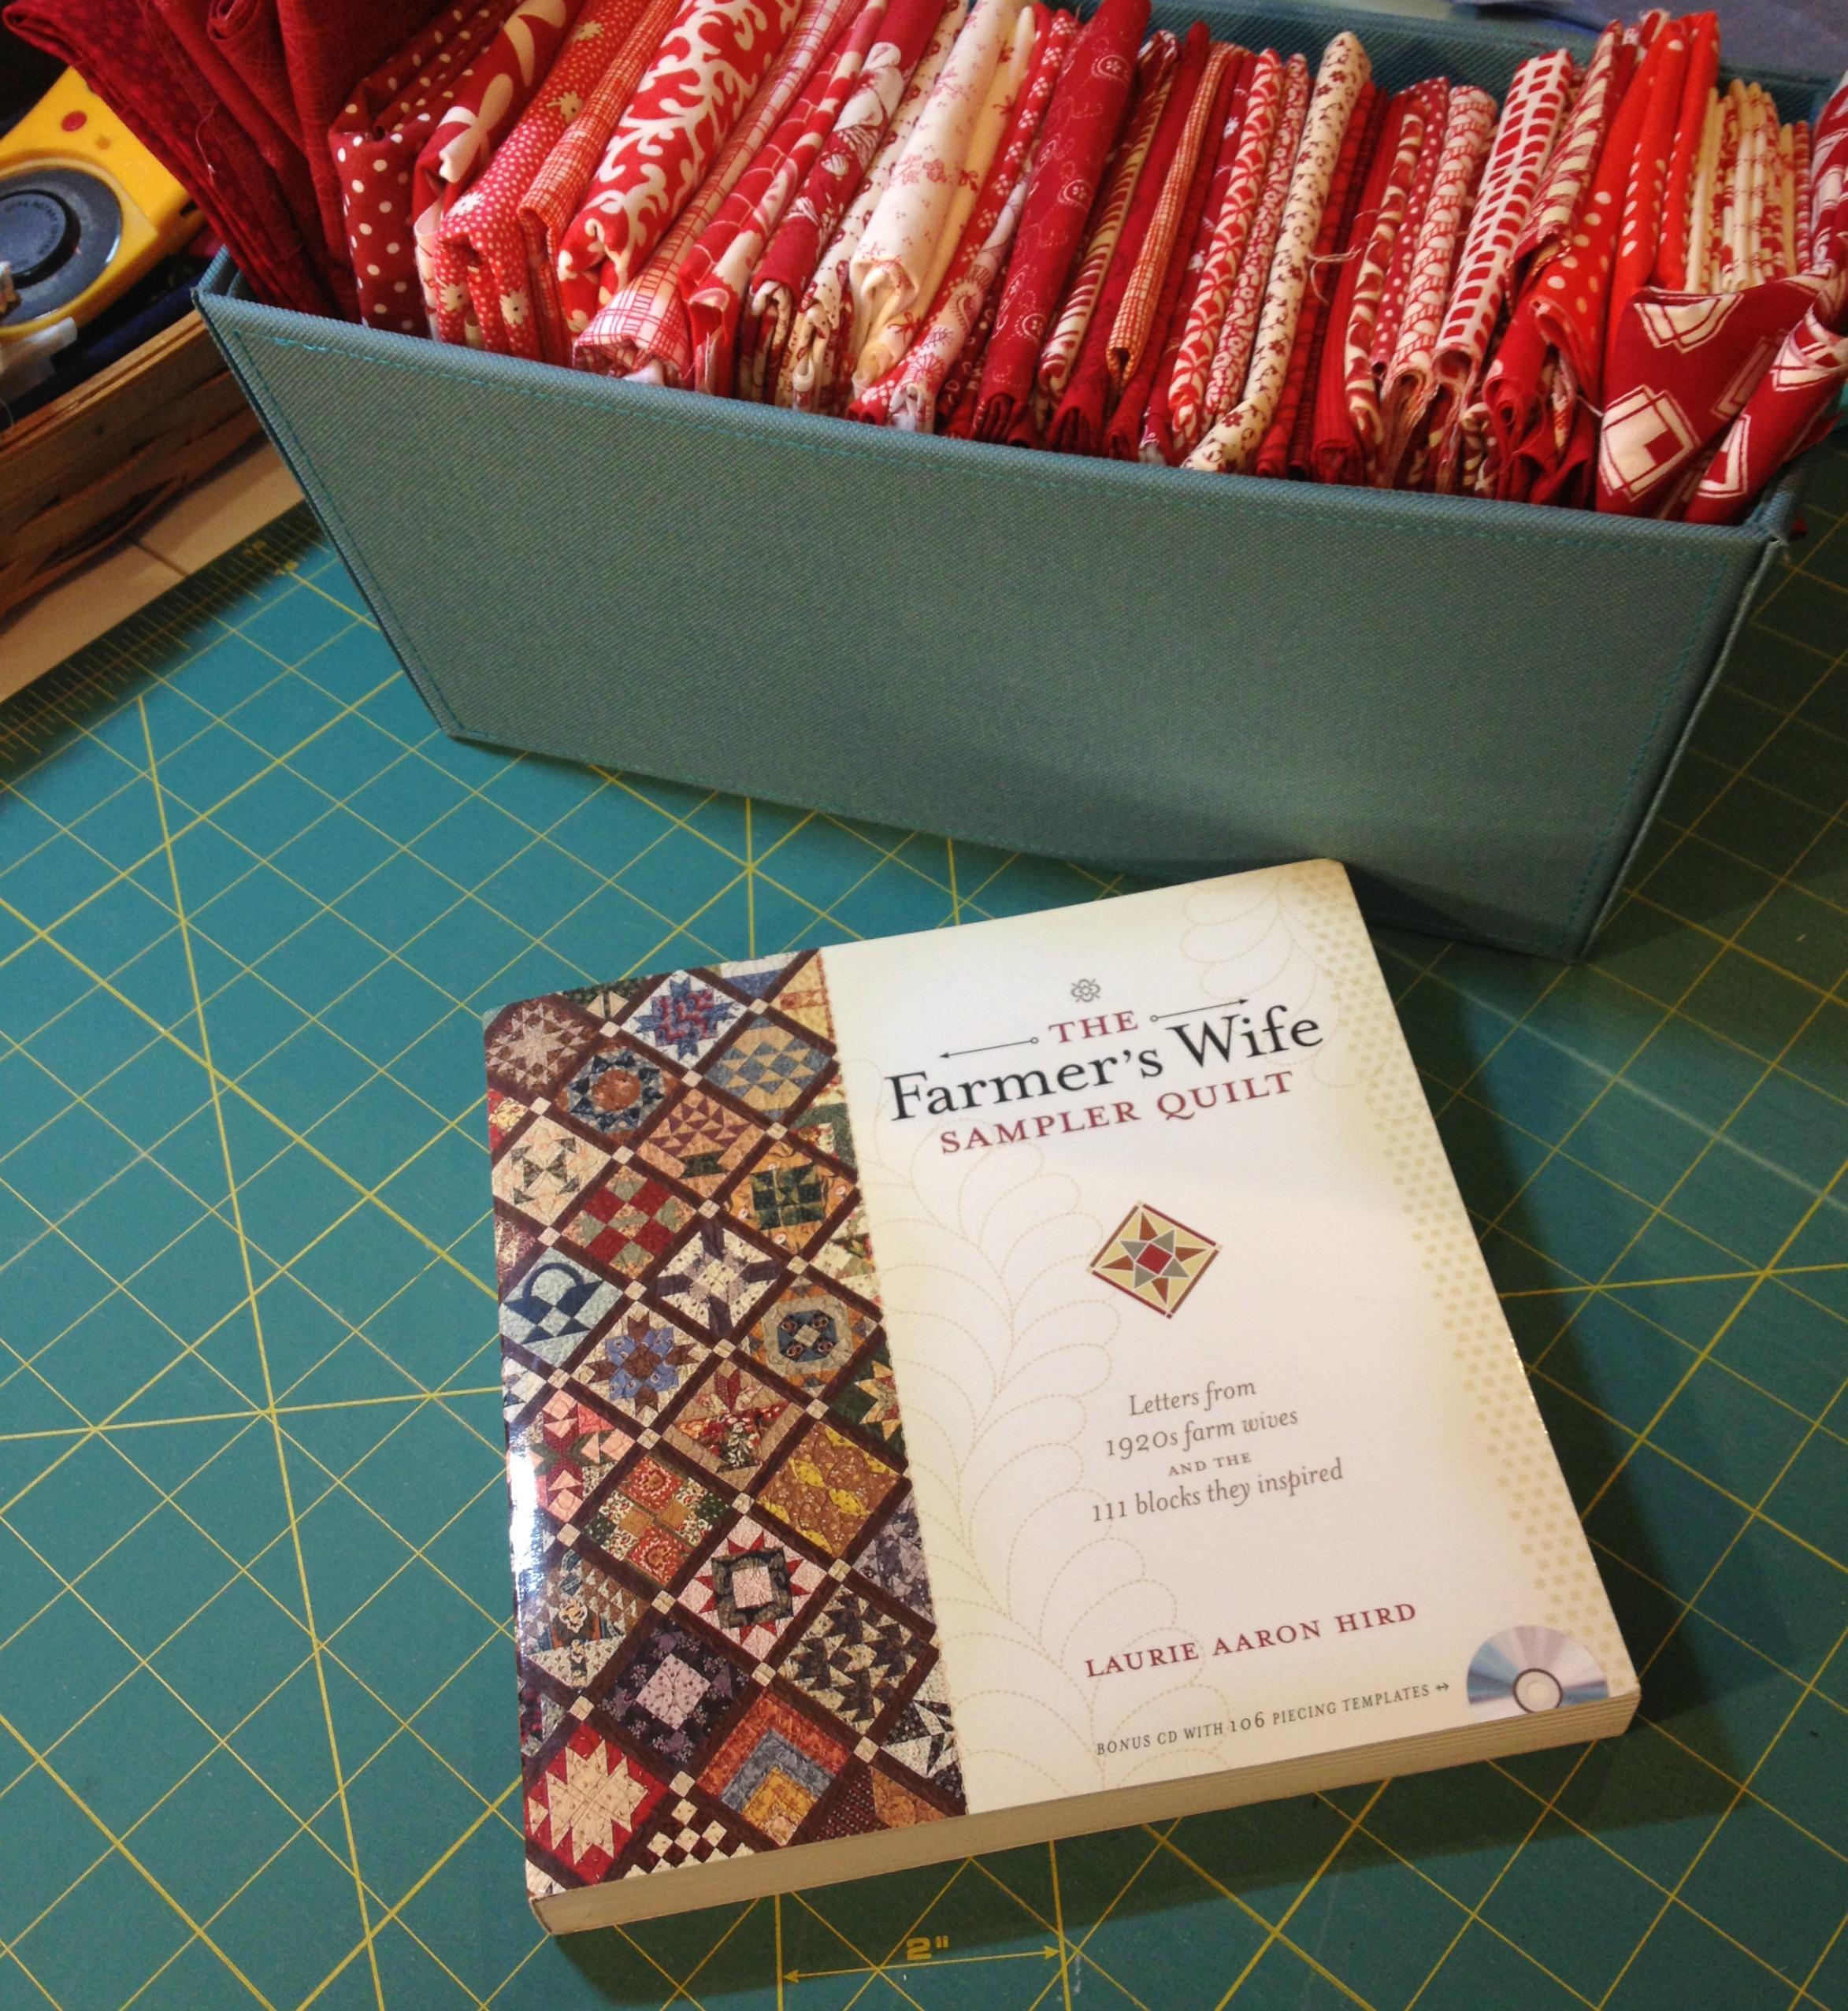 farmer's wife book and stash